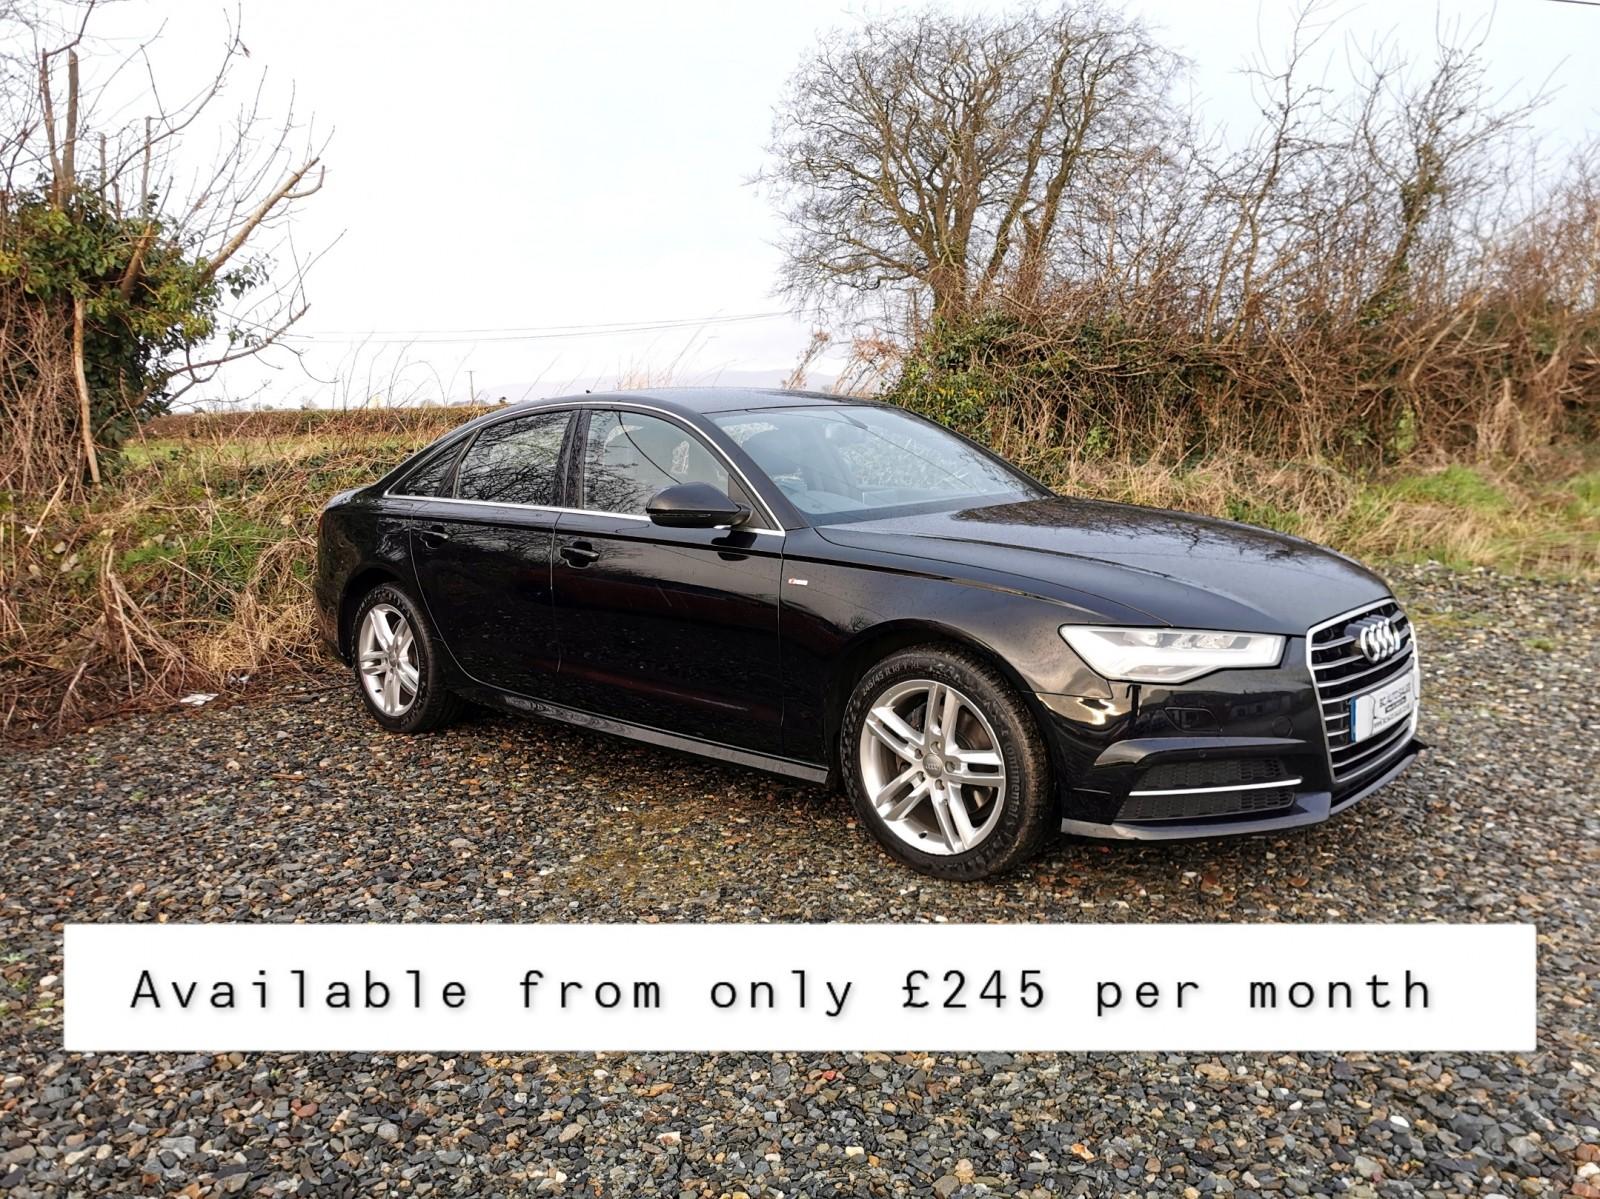 2015 Audi A6 TDI ULTRA S LINE Diesel Manual – BC Autosales 17A Airfield Road, Eglinton, Londonderry BT47 3PZ, UK